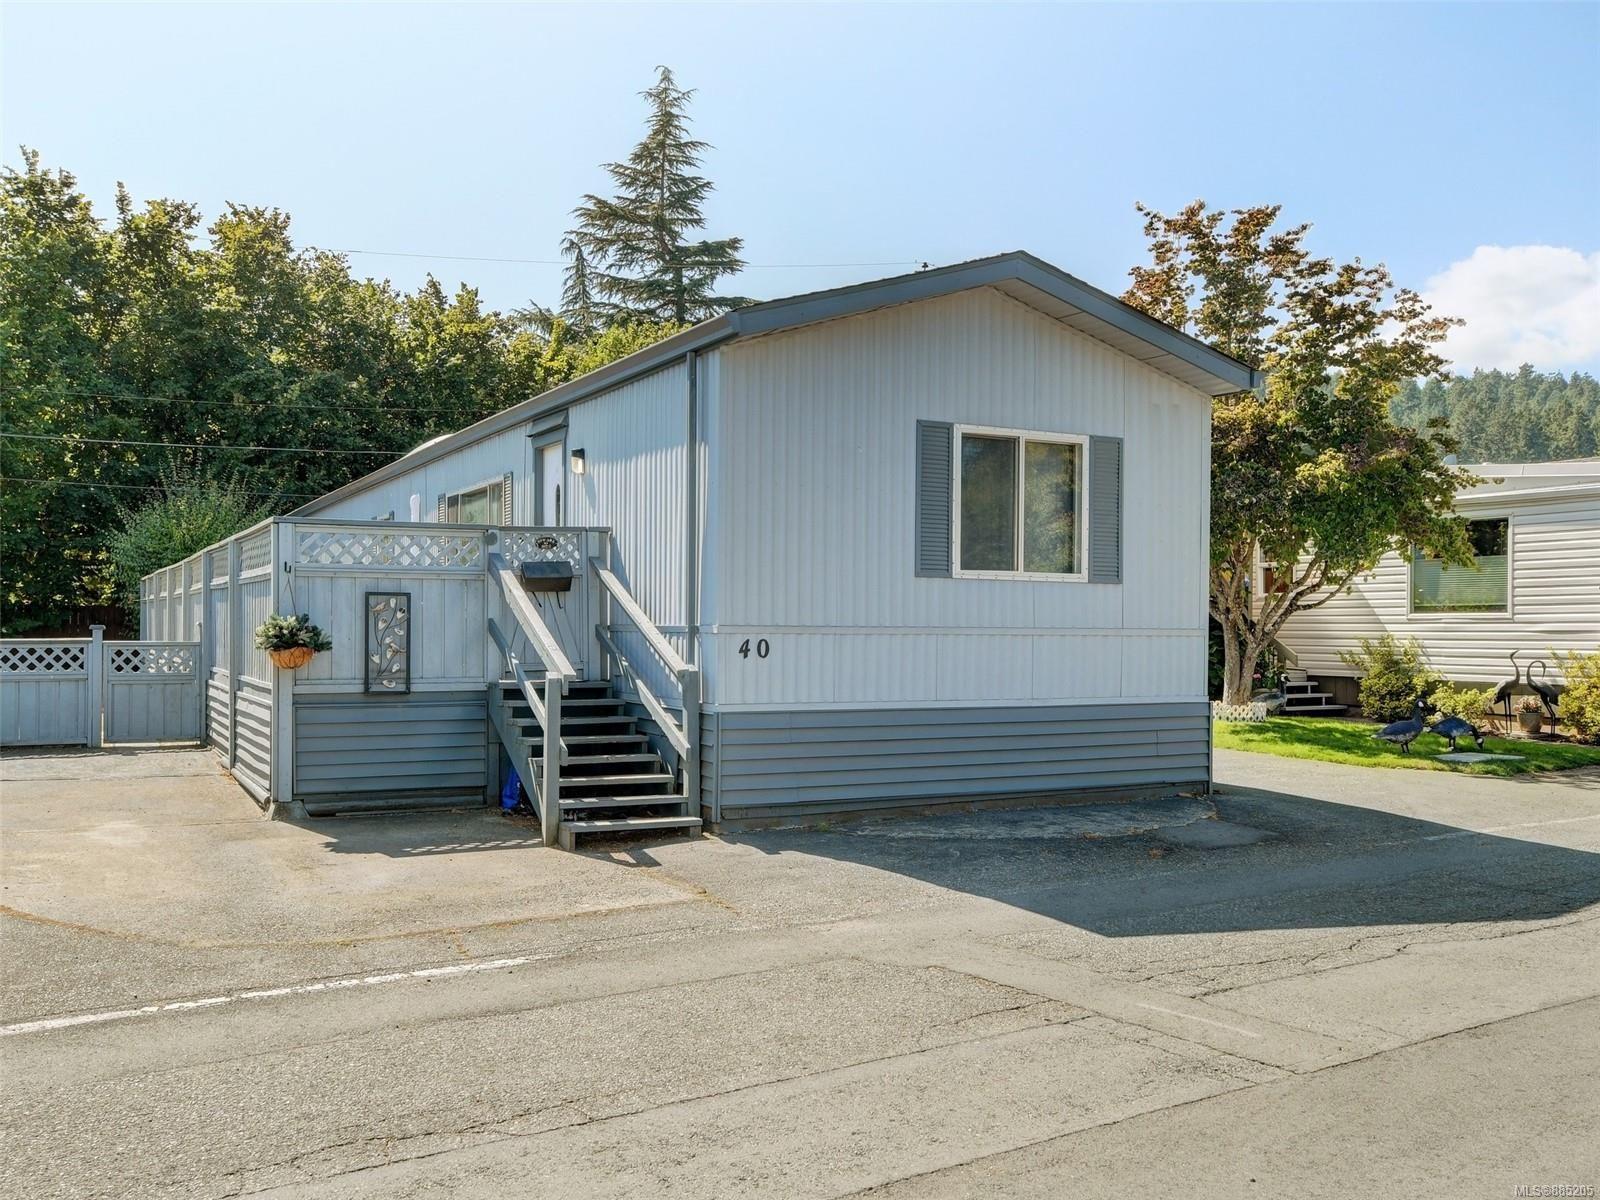 Main Photo: 40 2911 Sooke Lake Rd in : La Goldstream Manufactured Home for sale (Langford)  : MLS®# 885205